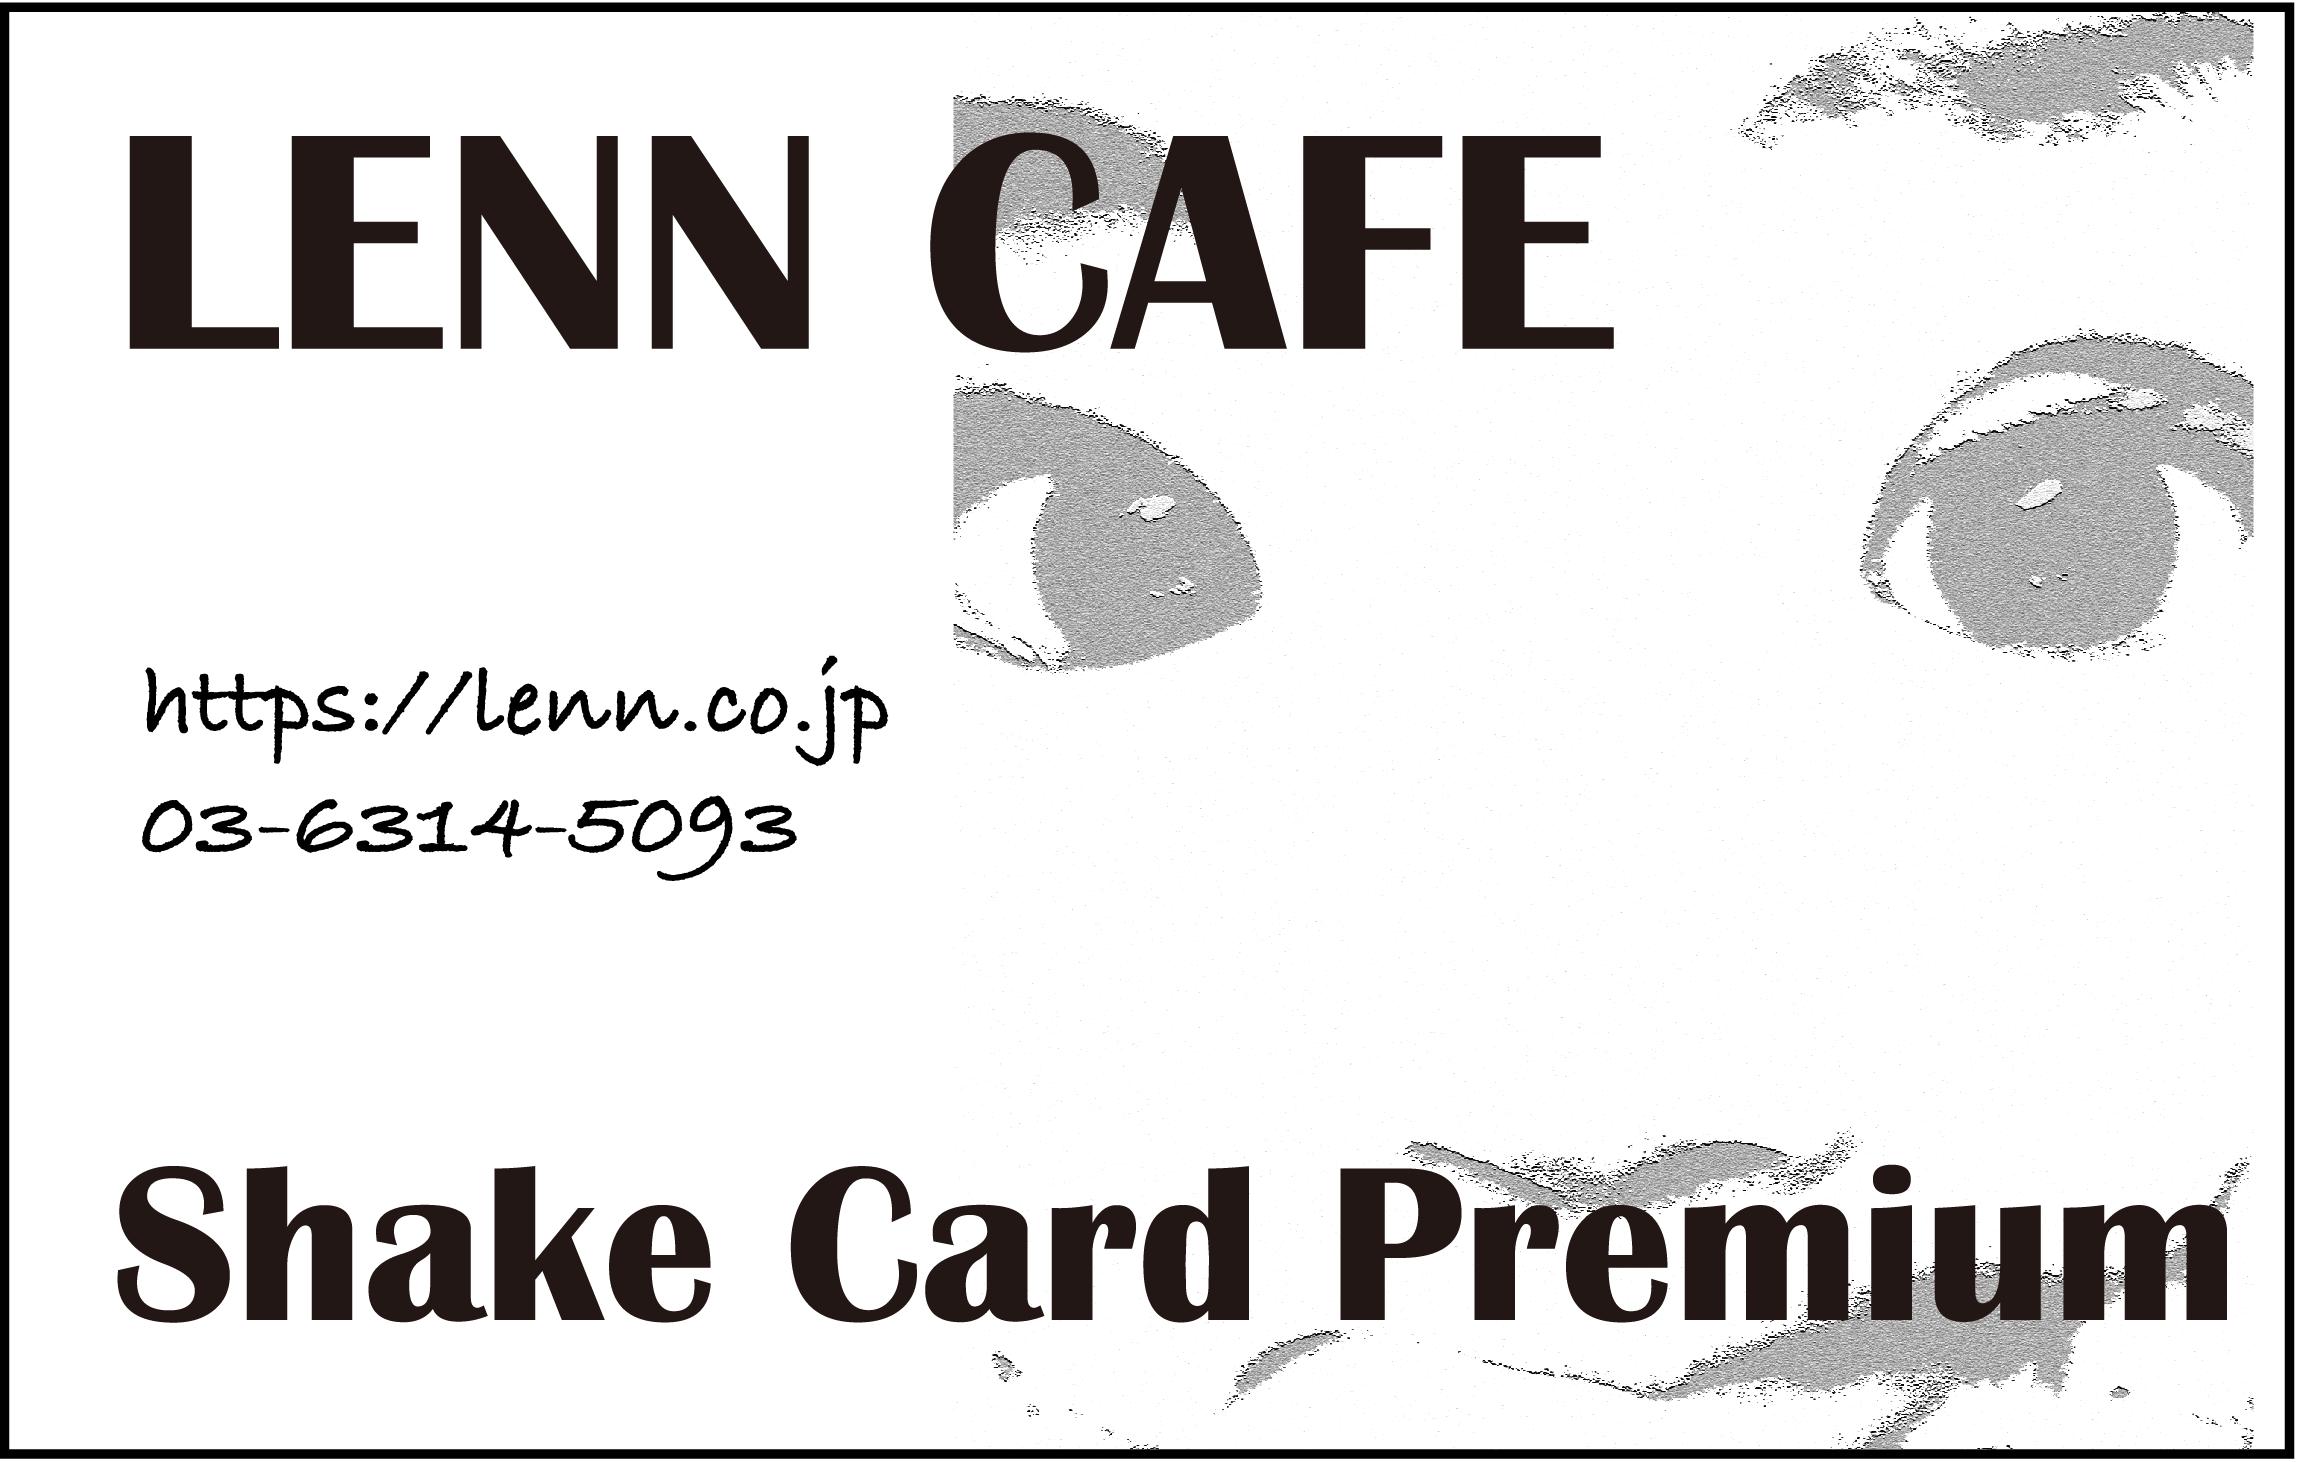 LENN CAFE(レンカフェ)Shake Card(シェイクカード)「れんかふぇ・れんカフェ」2